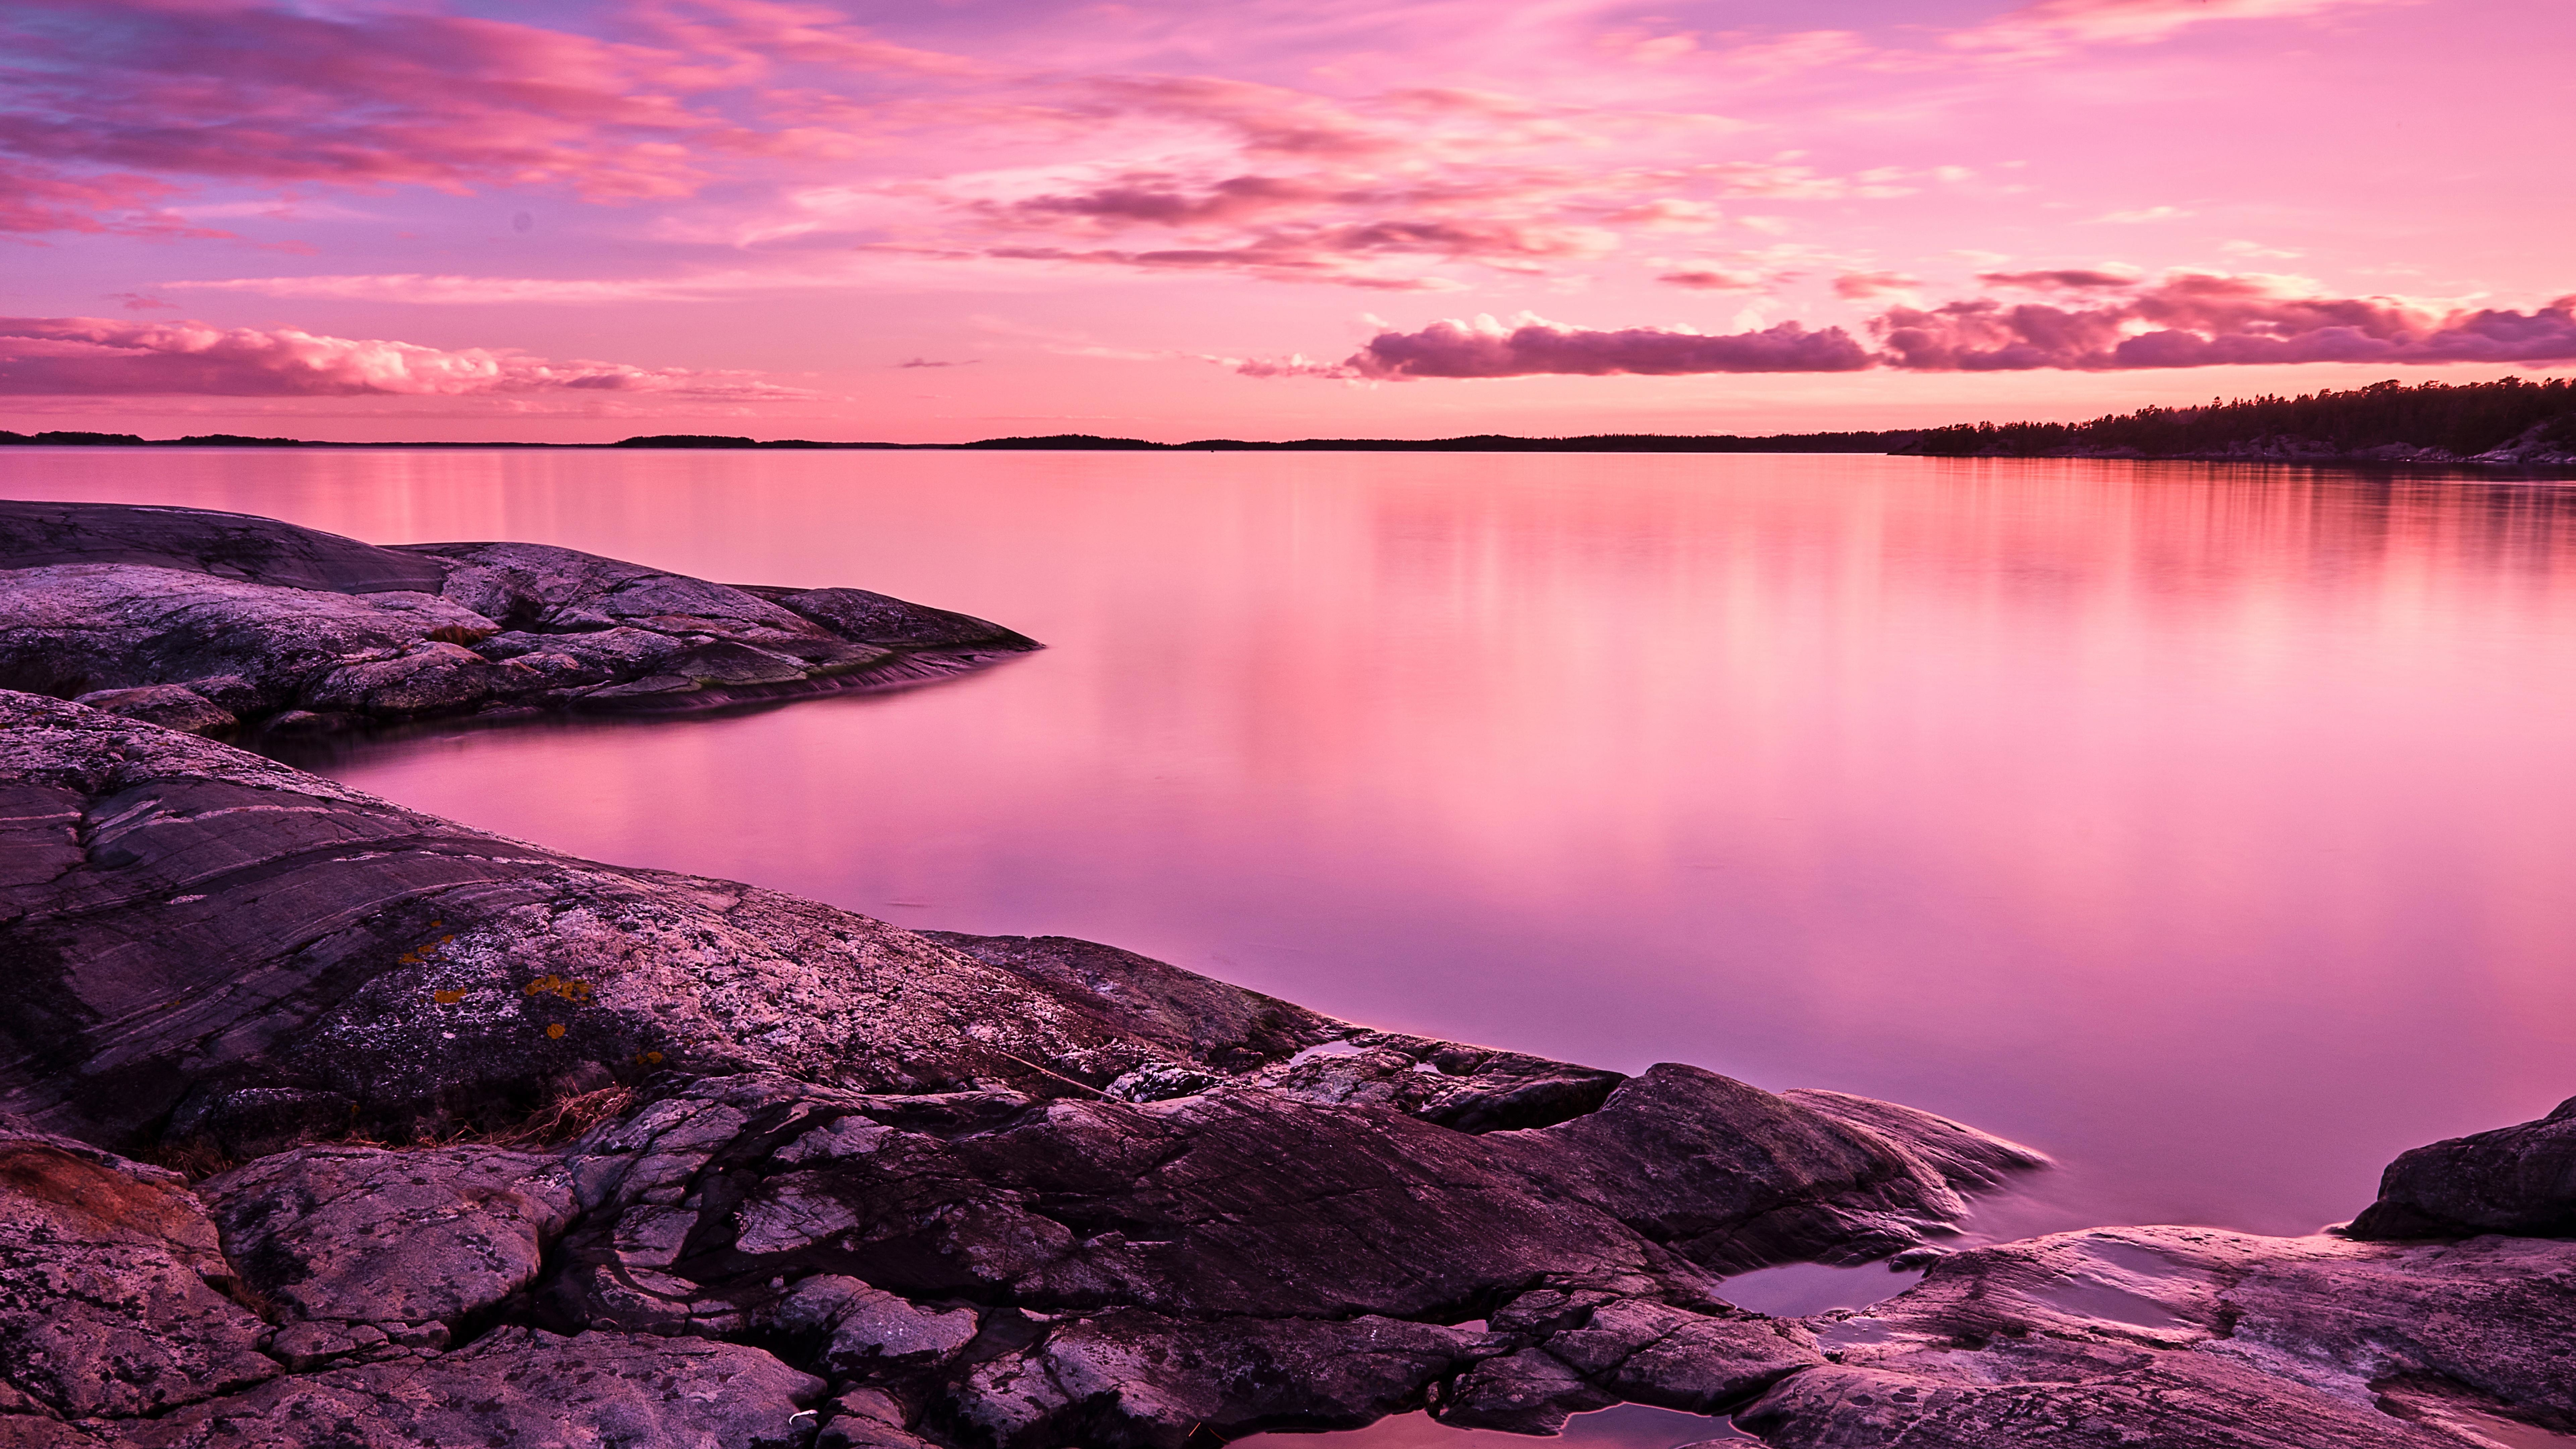 Pink Lake 8k Wallpaper Hd Nature 4k